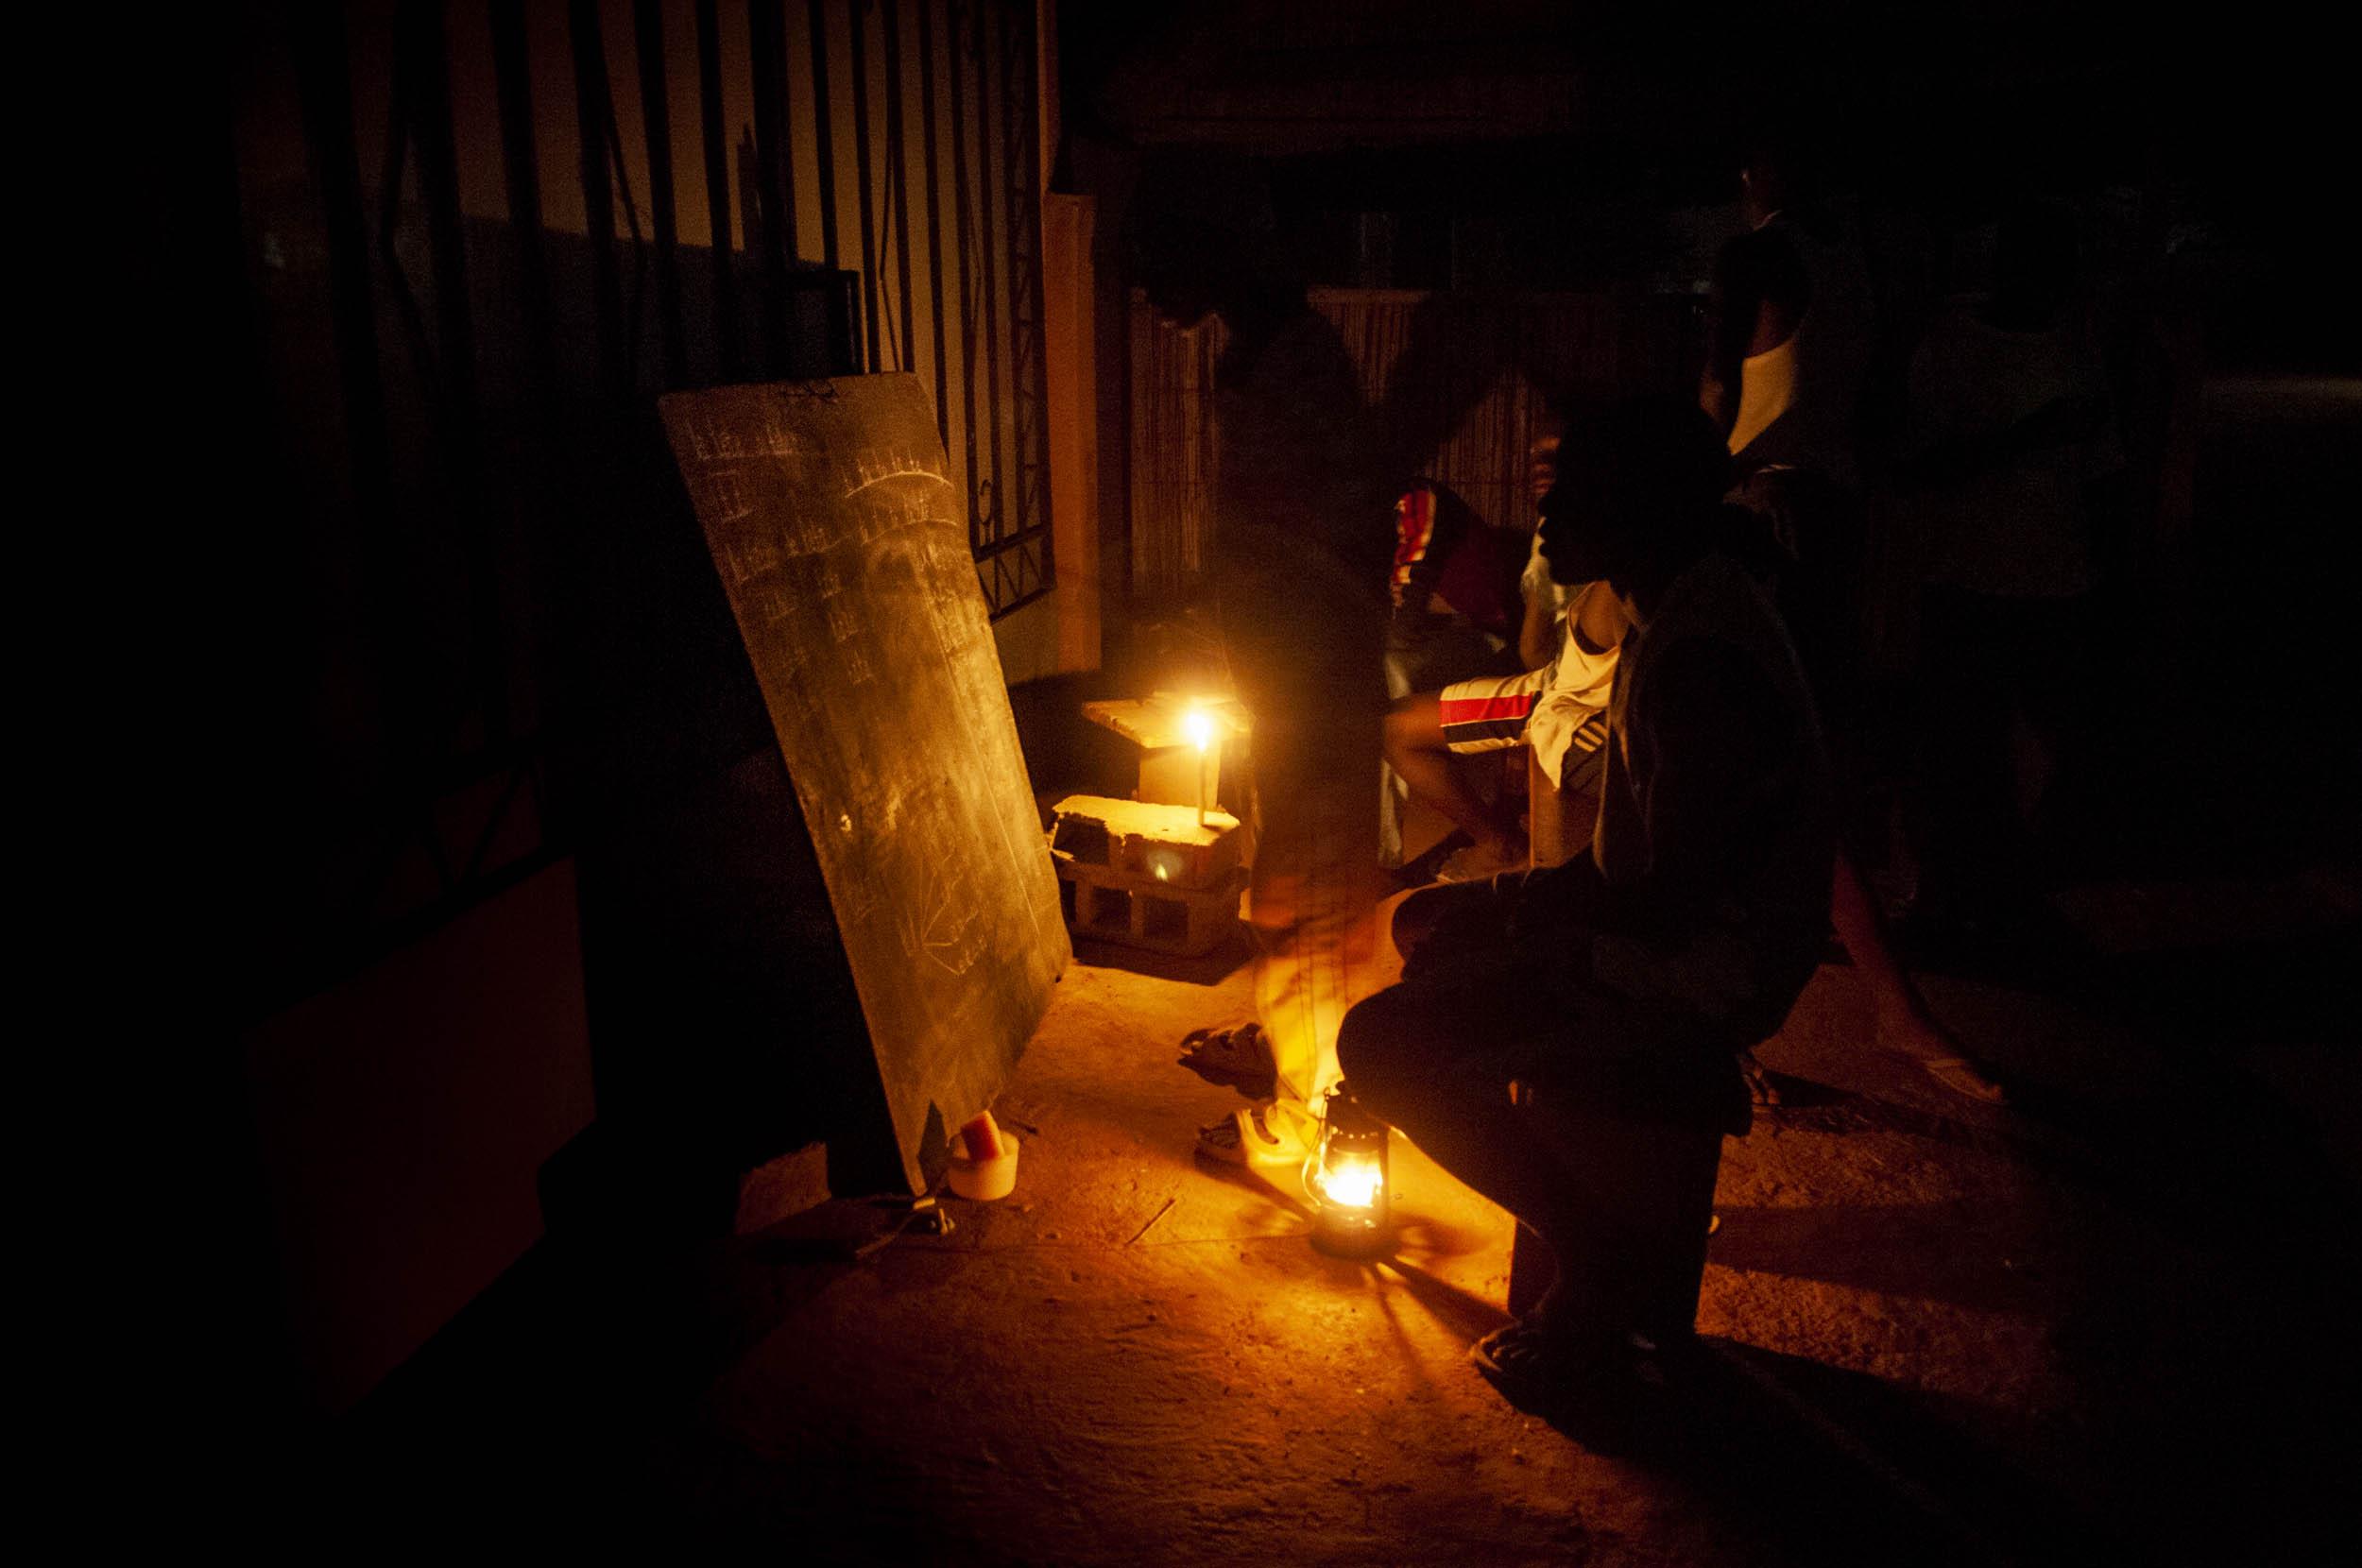 Maestro nocturno, Burkina Faso - Ethnoland - Hector Garrido, Aerial and human photography